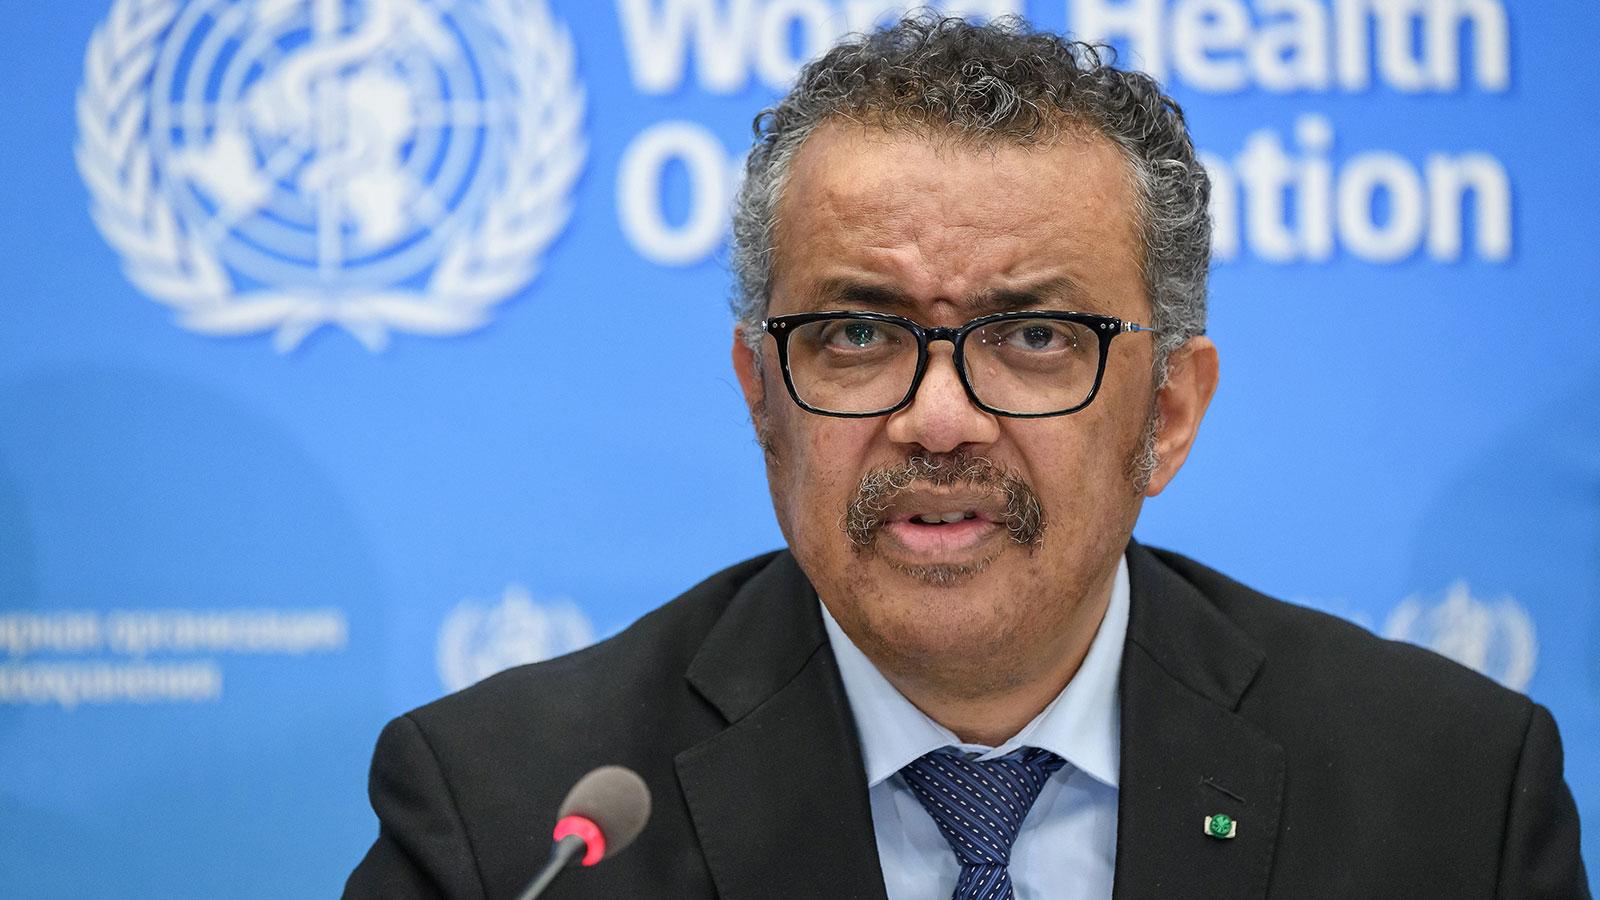 World Health Organization director general Tedros Adhanom Ghebreyesus gives a news conference on the situation regarding the coronavirus in Geneva on February 24.